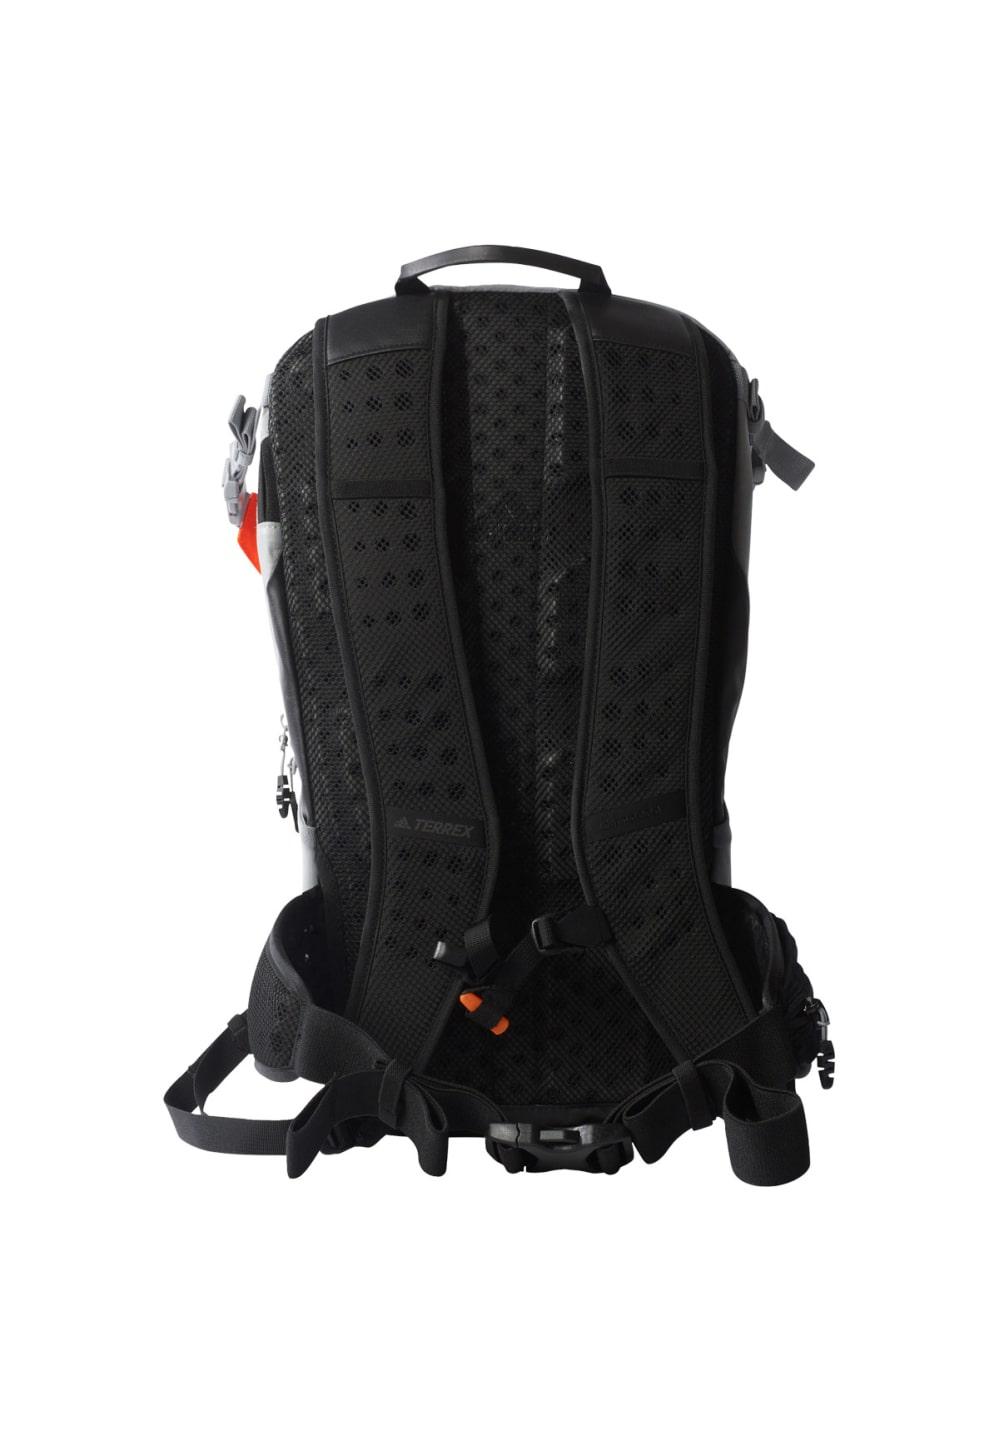 Terrex Trail À Adidas Cross Dos Sac Backpack Gris eH9E2DIYbW